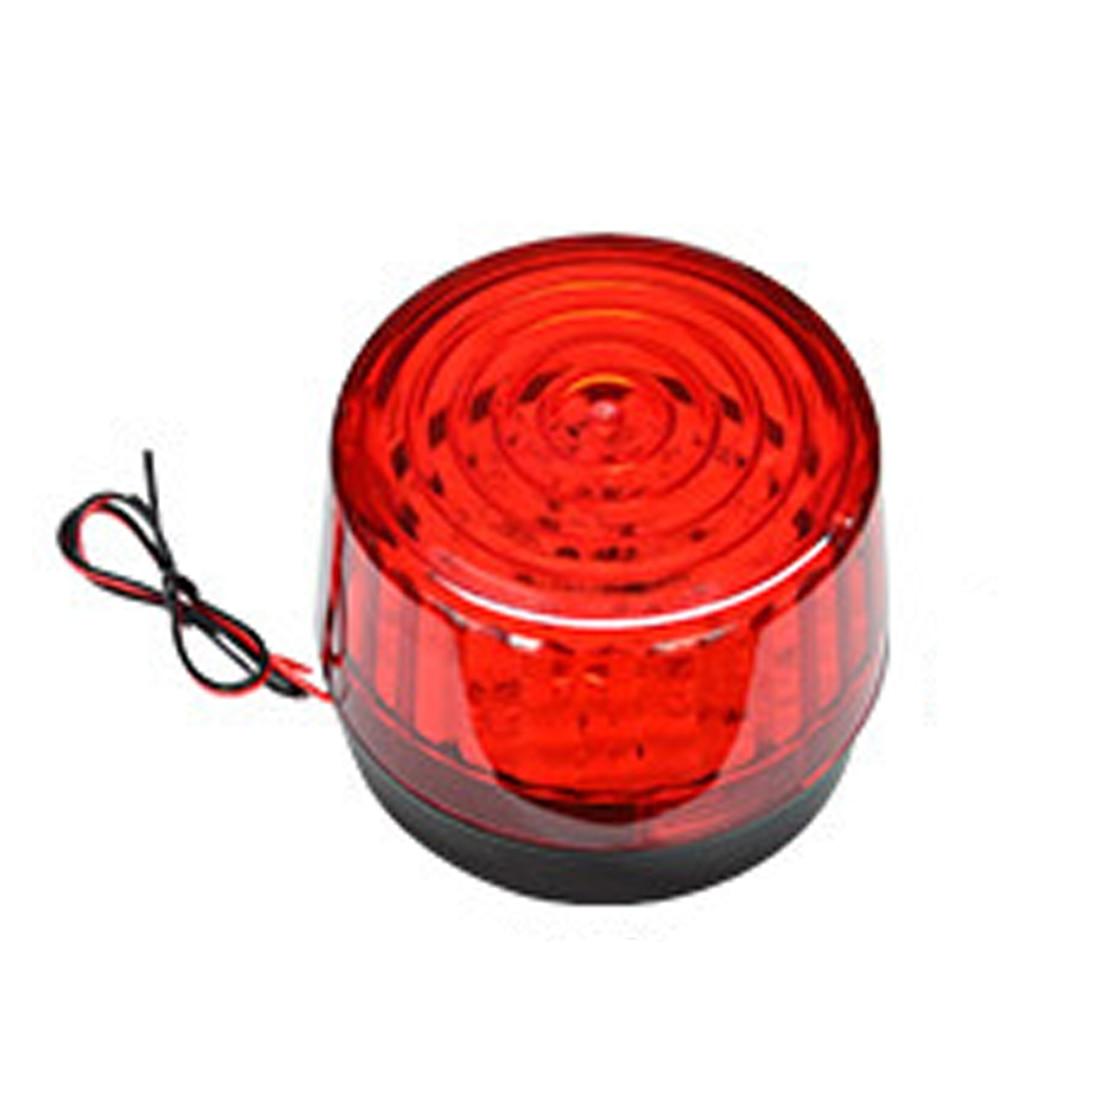 DC12V Mini Wired Strobe Siren Signal Warning Light Flash Siren LED Highlight Alarm Lamp for Car Security Alarm System